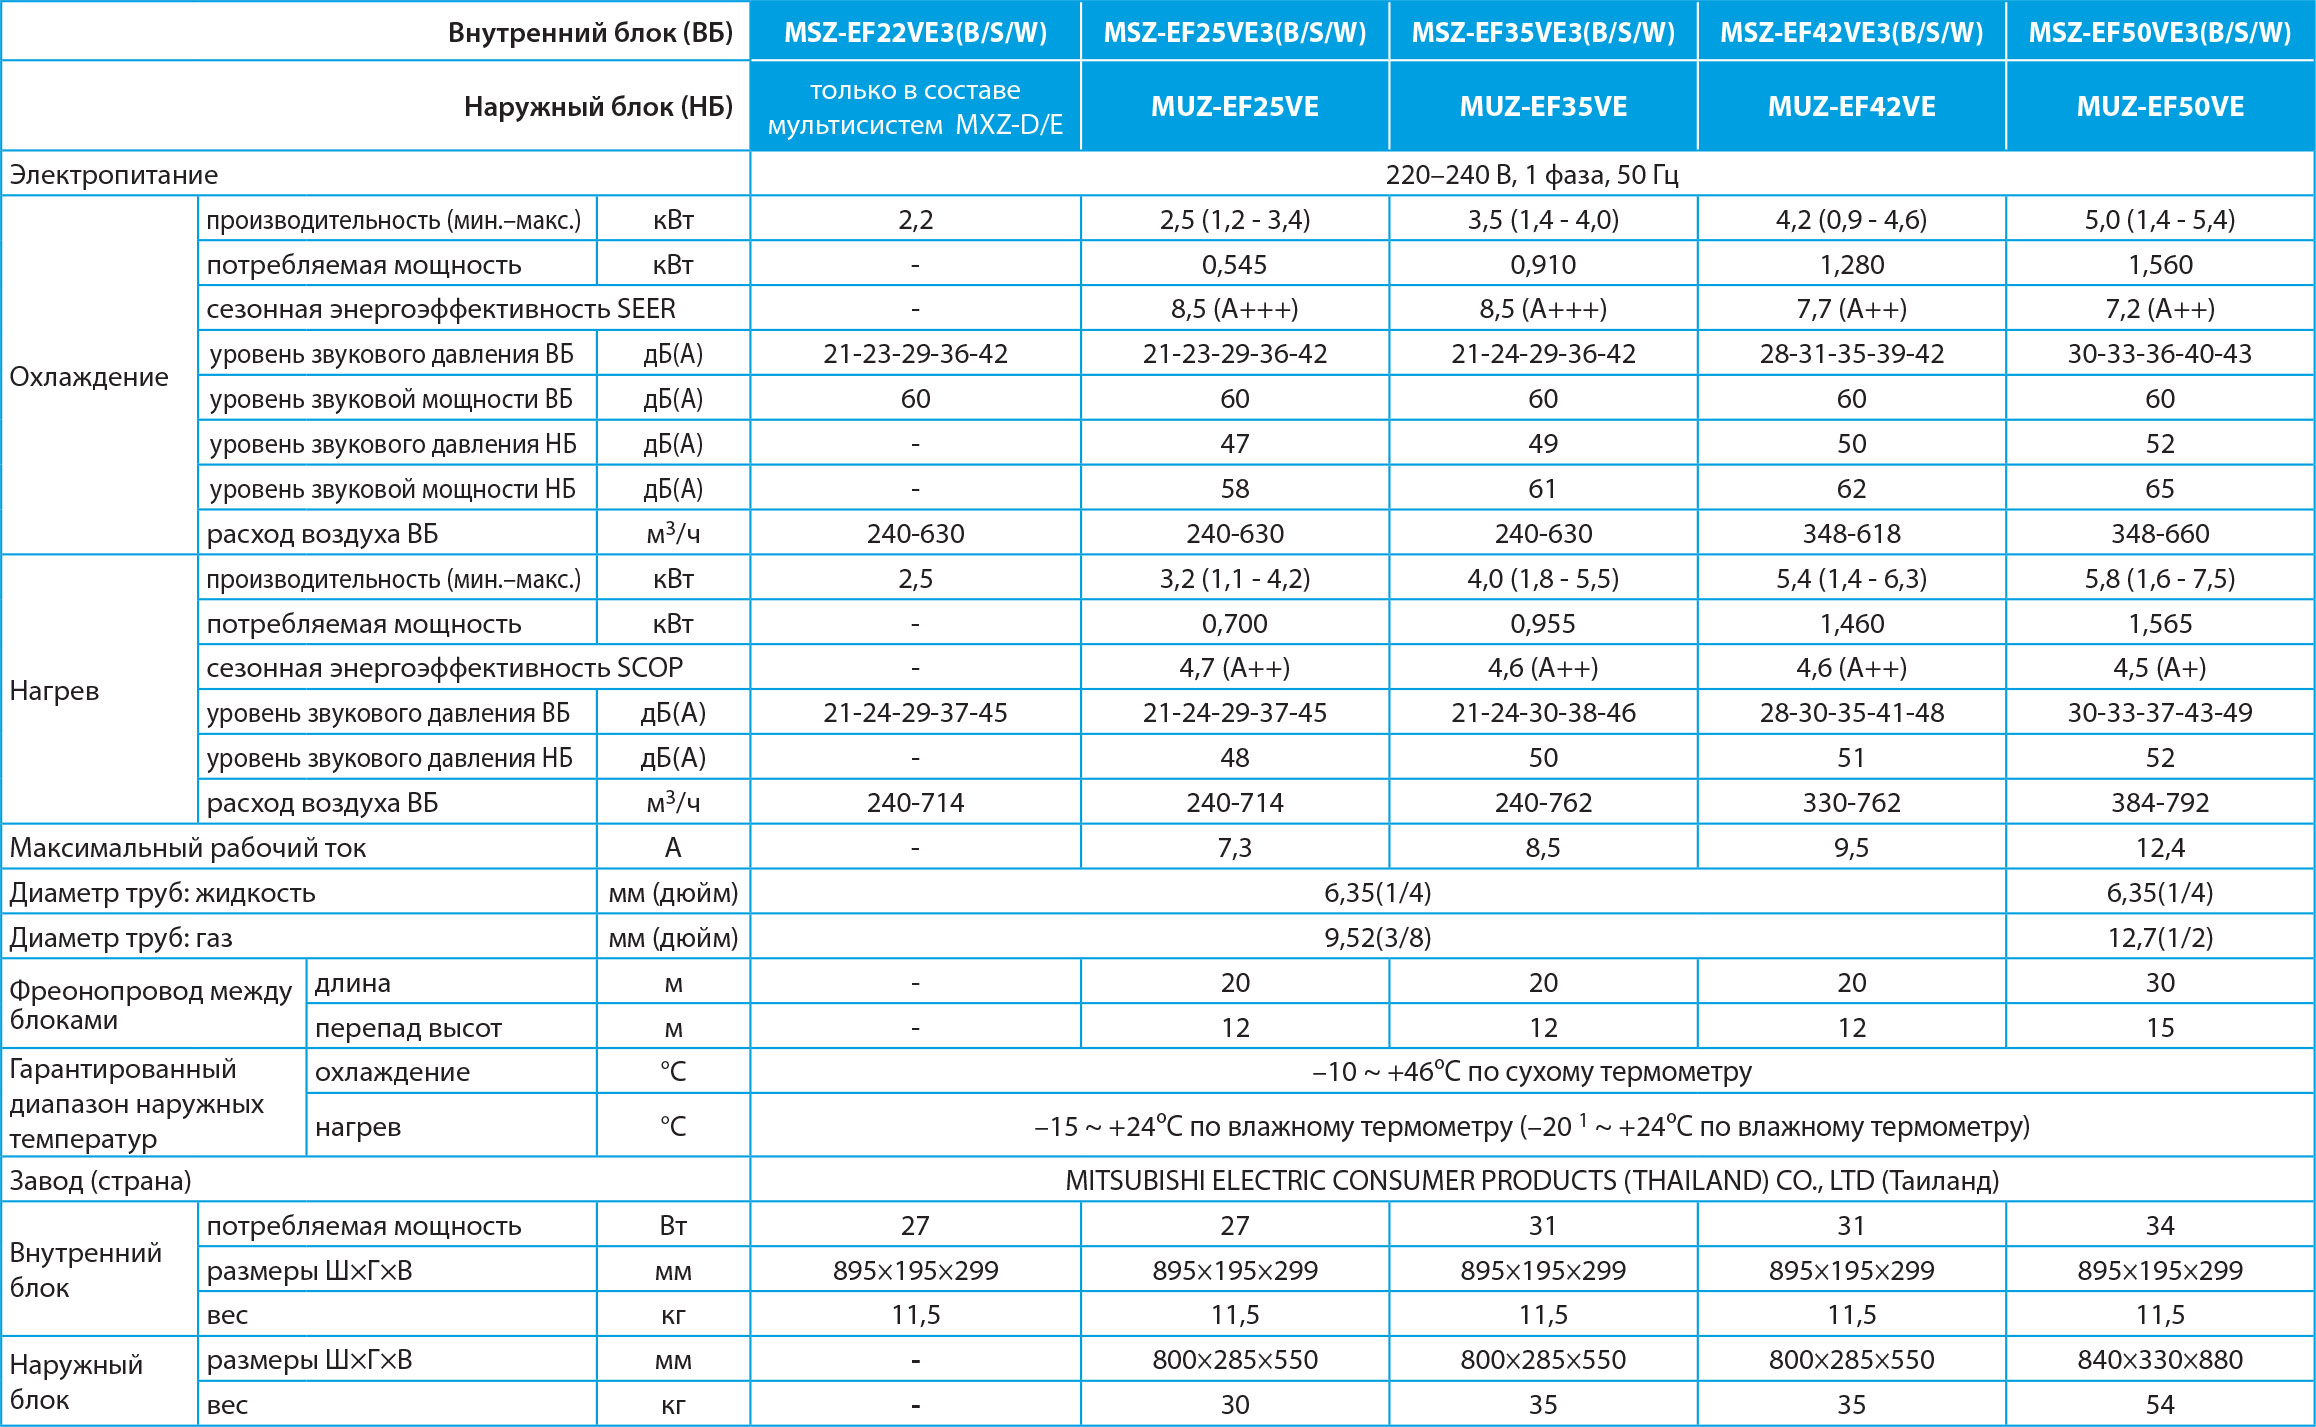 Технические характеристики кондиционера Mitsubishi Electric MSZ-EF35VEW / MUZ-EF35VE серии Design Inverter